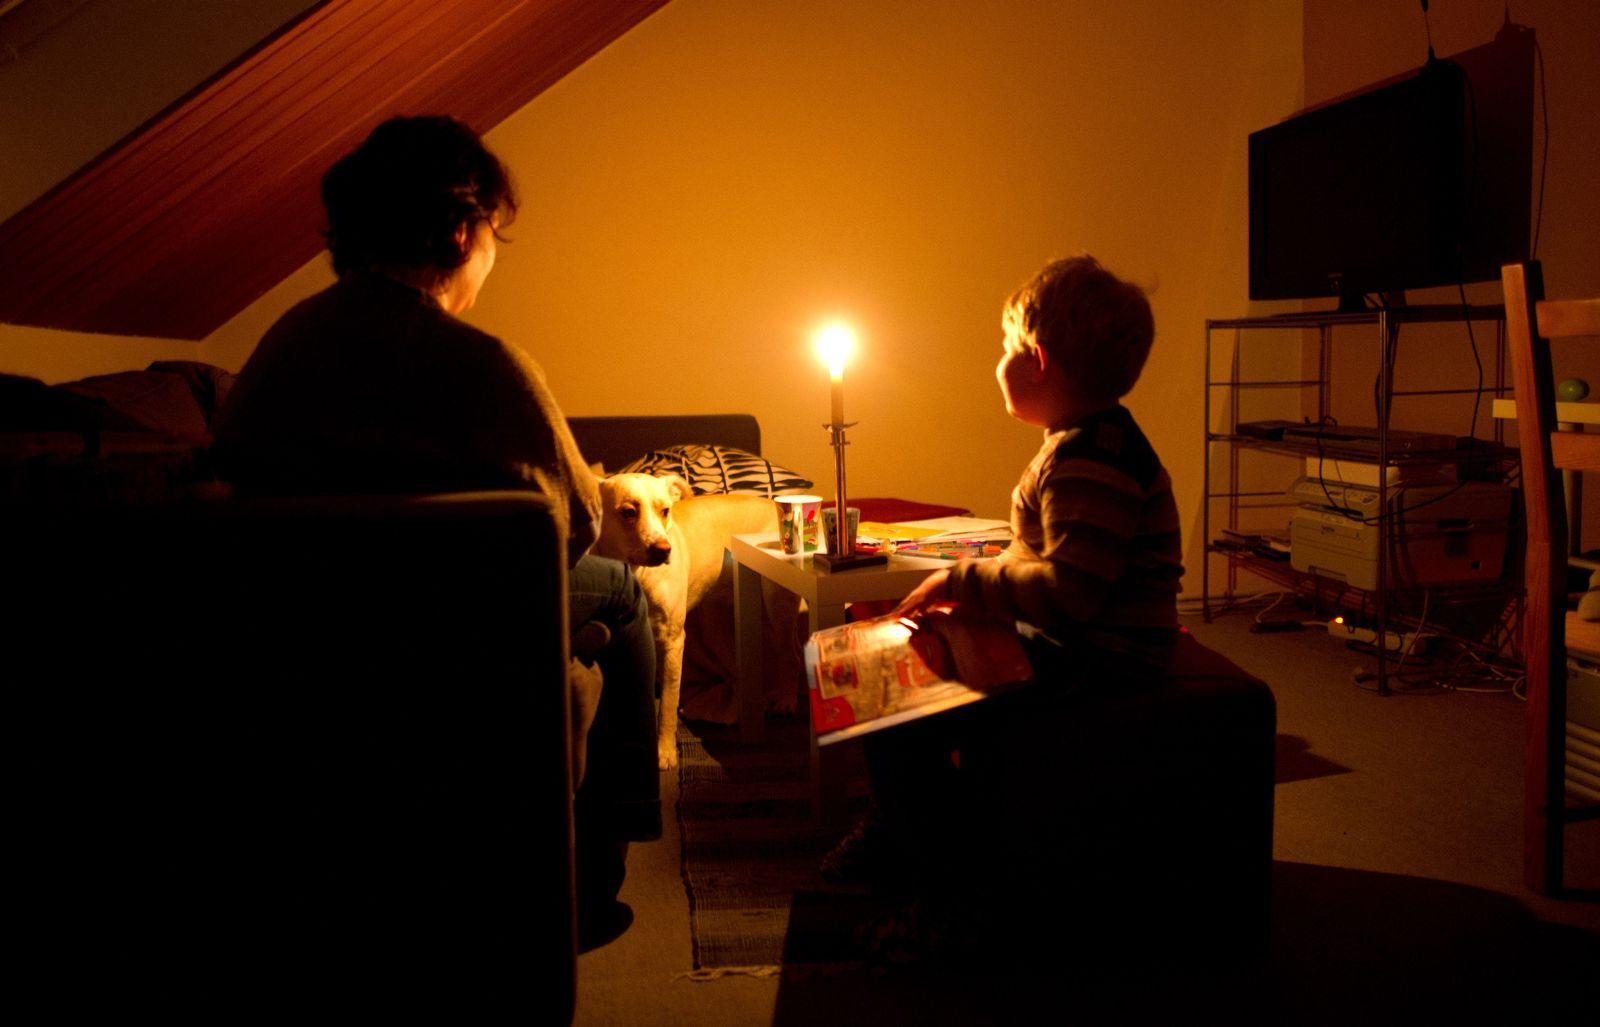 Strom / Sparren / Energie-Armut